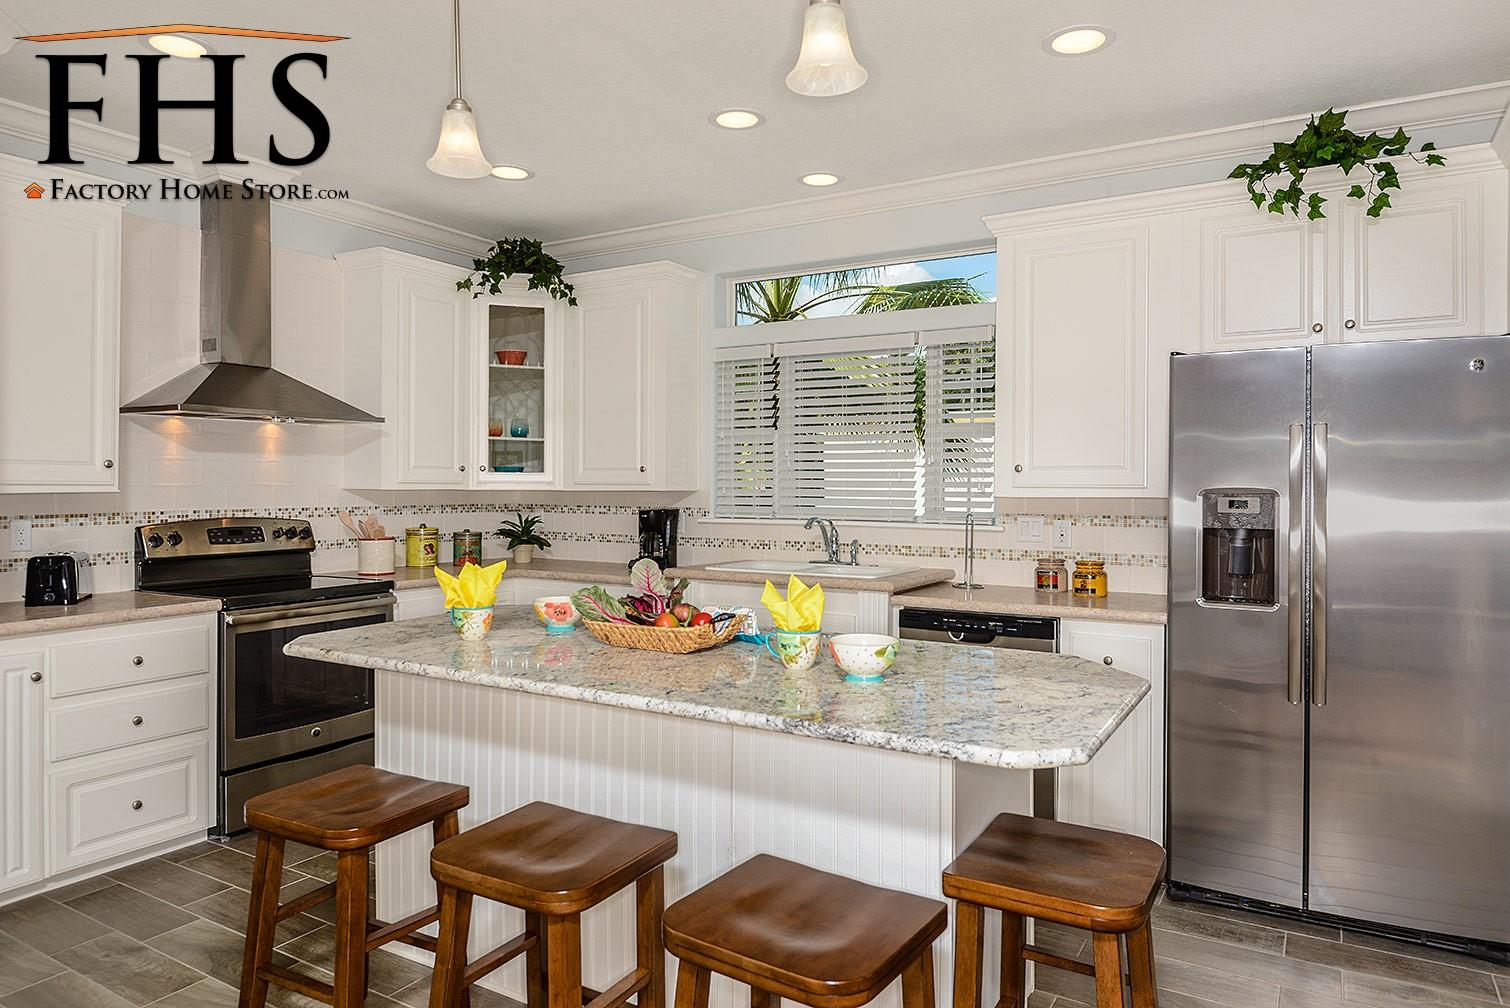 Citrus Homes / Meadowood Homes of Florida South image 0